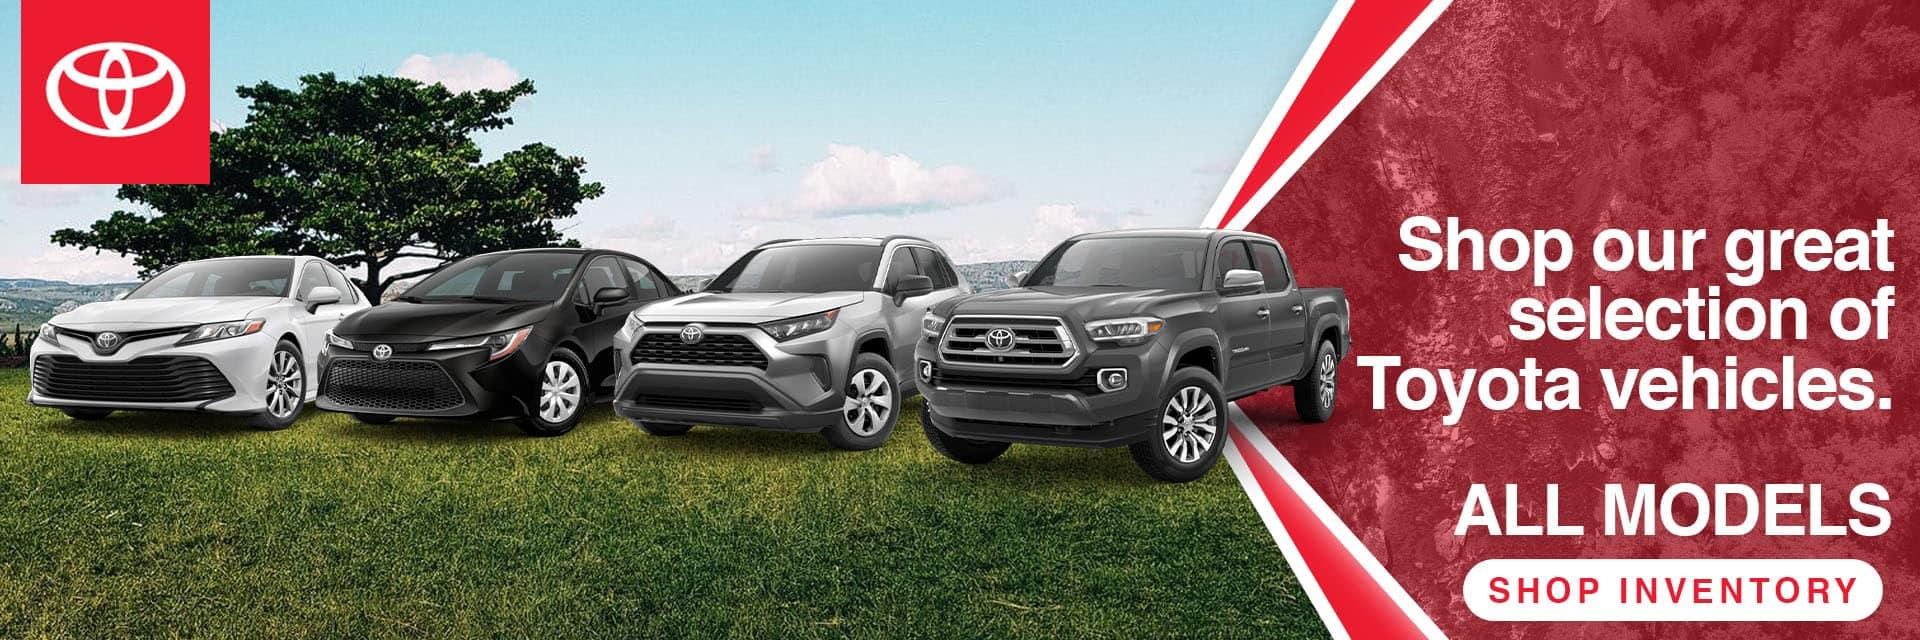 Toyota's Invetory Slide – Copy